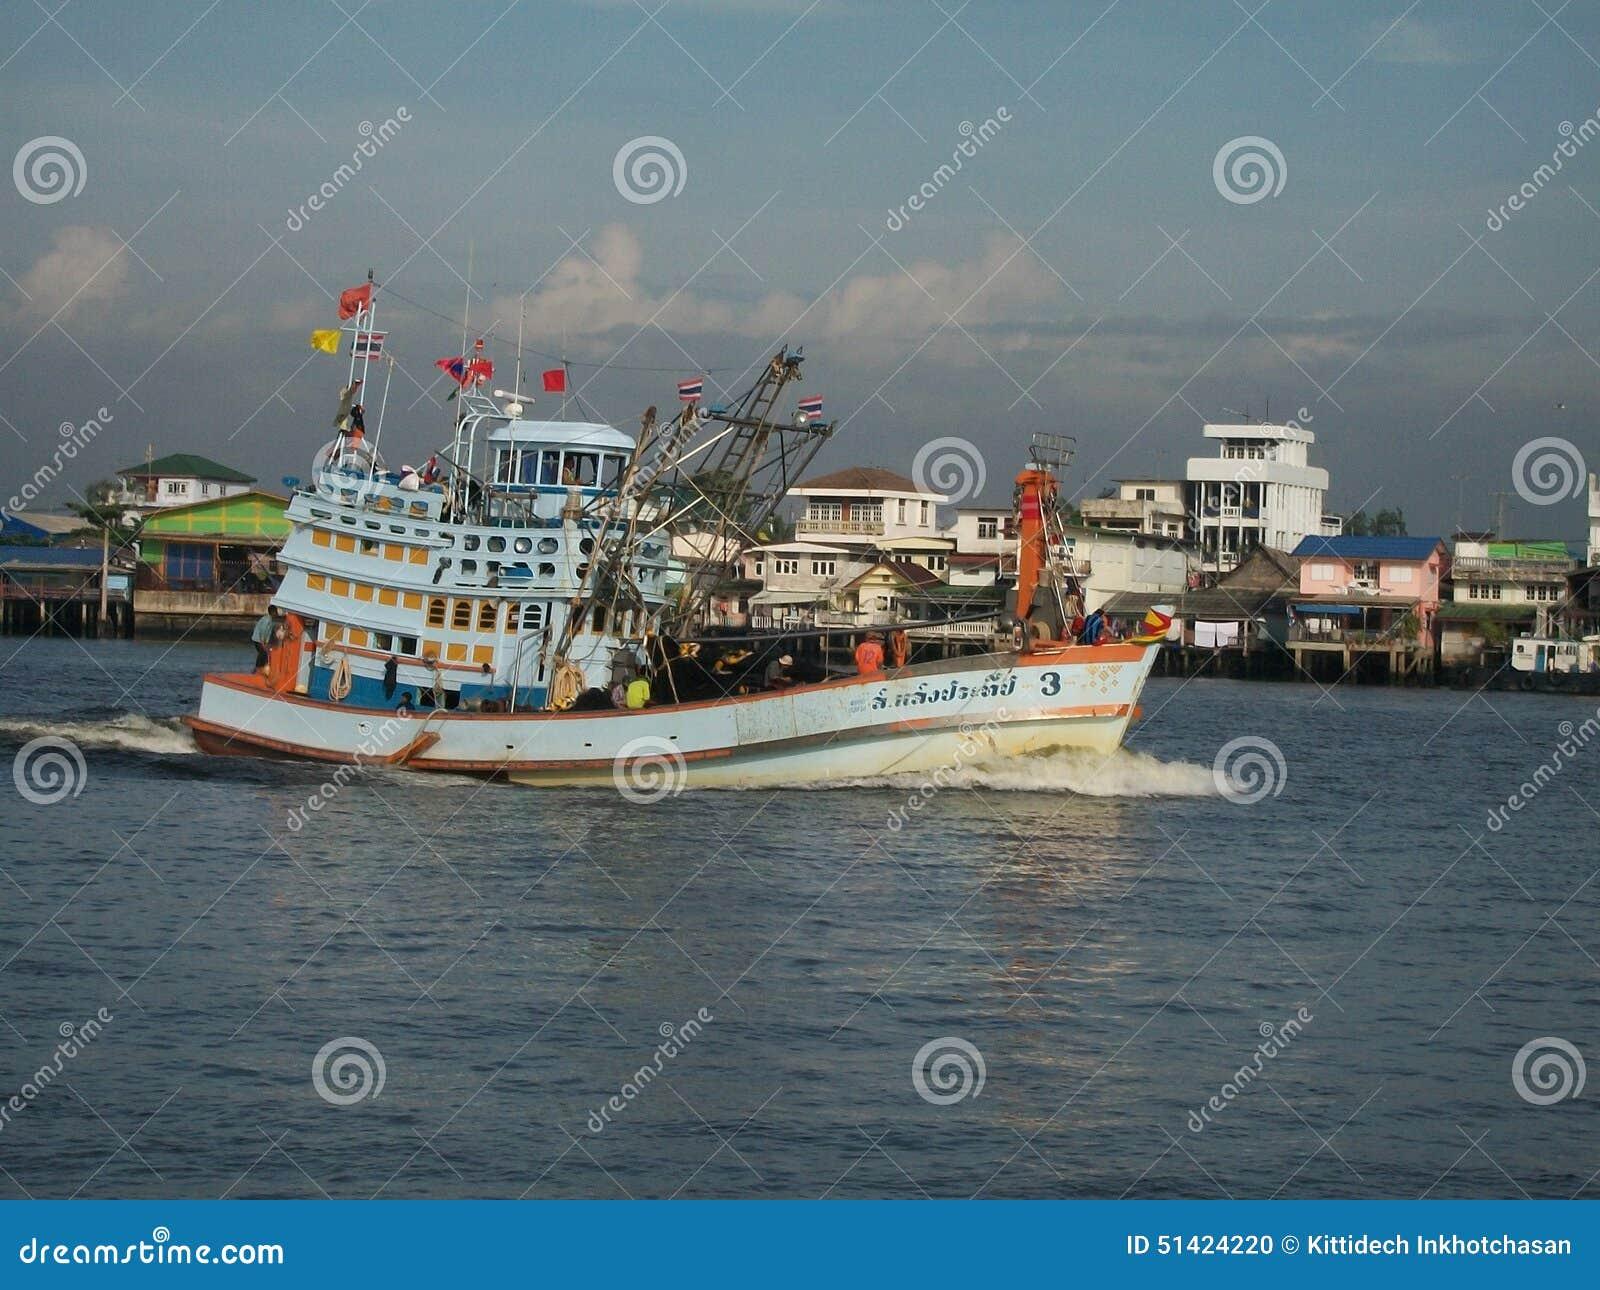 Purse seine fishing boat editorial image image 51424220 for Purse seine fishing